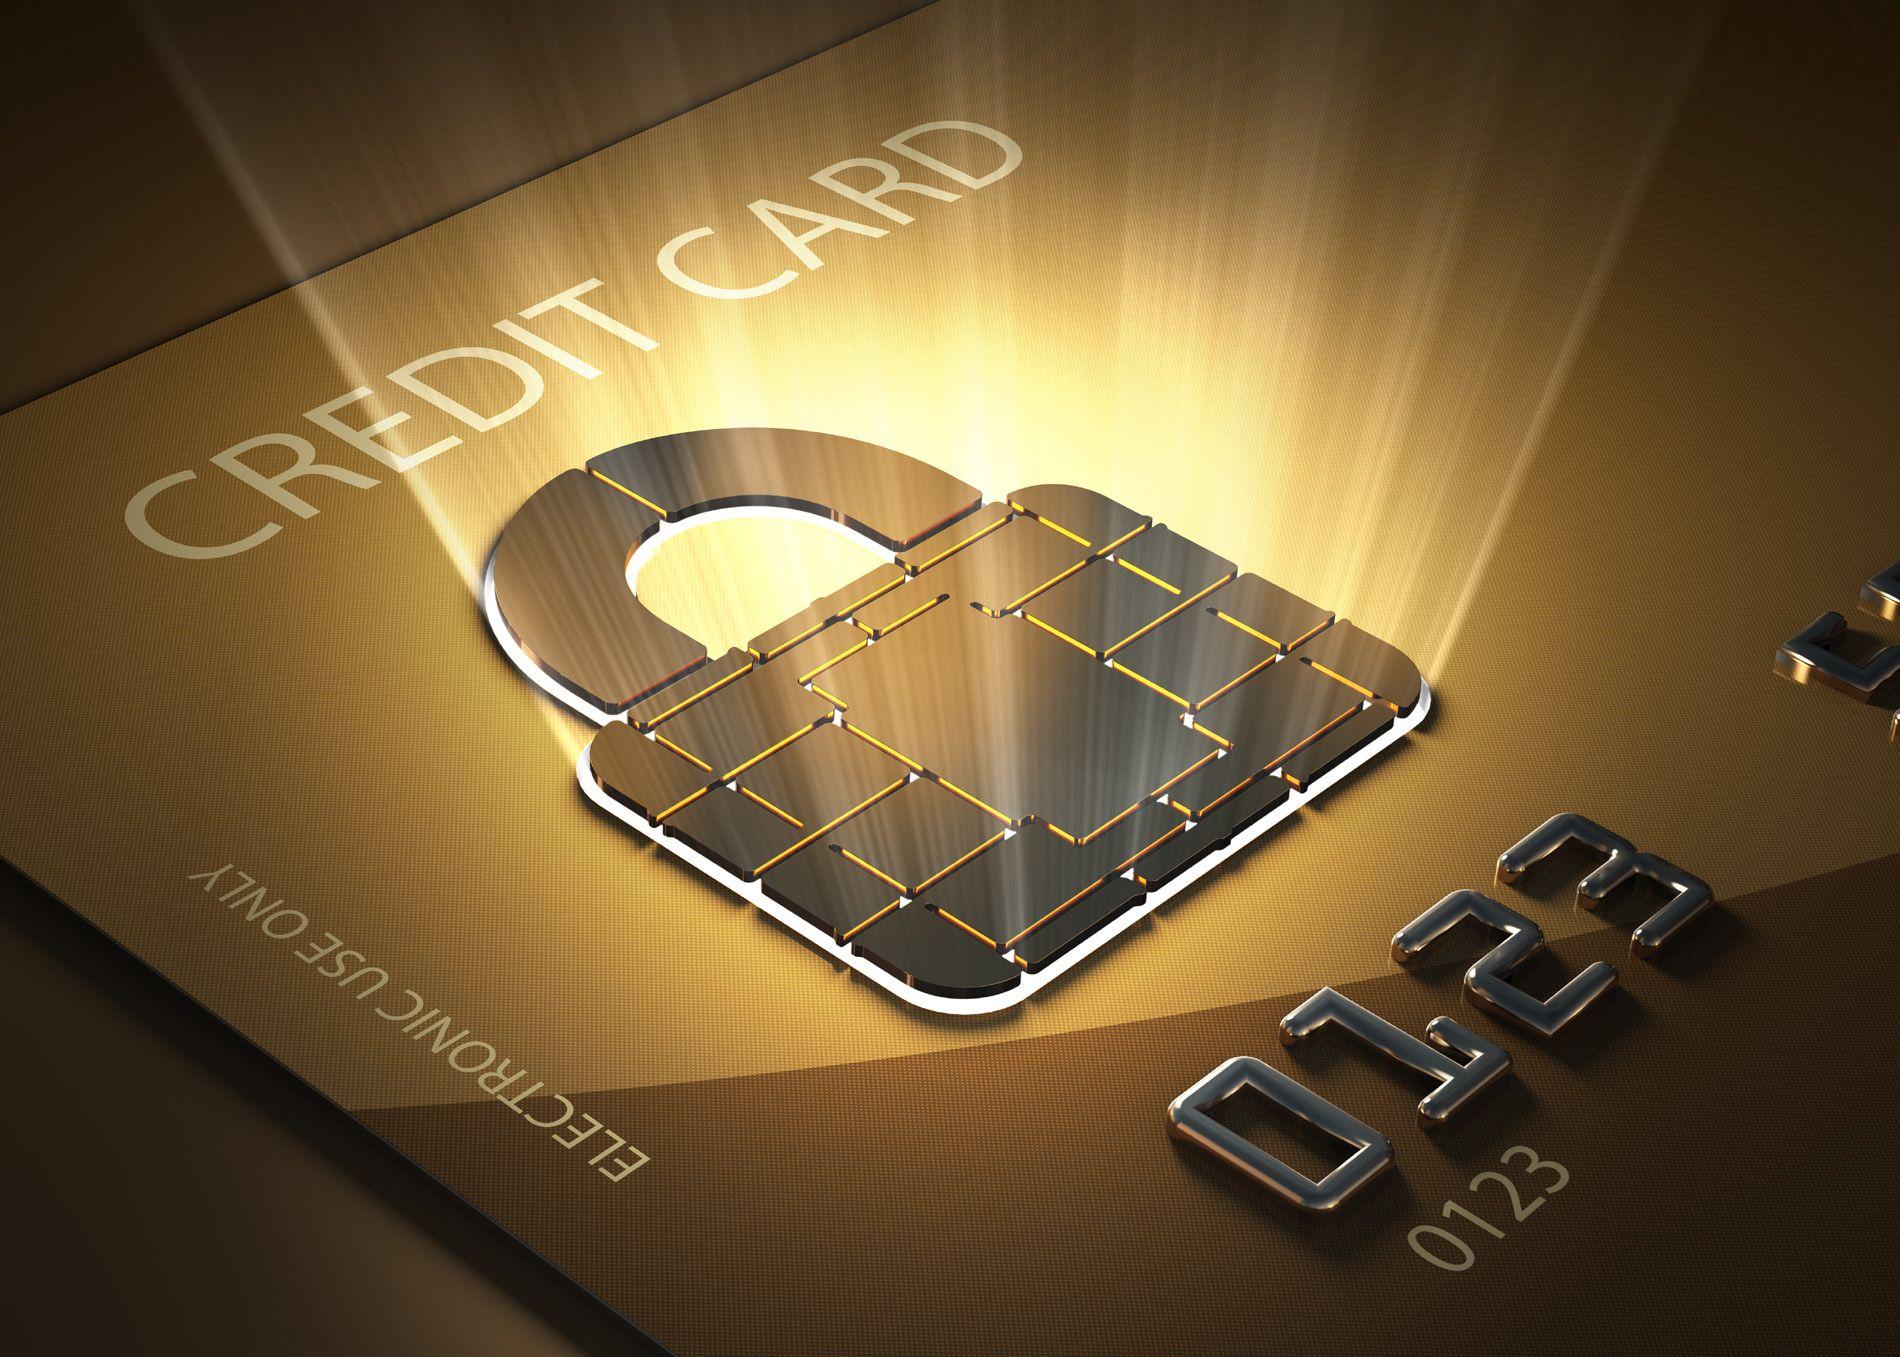 Data Paga se pasa al sistema de tarjetas prepago gracias a la consultora bancaria Foster Swiss